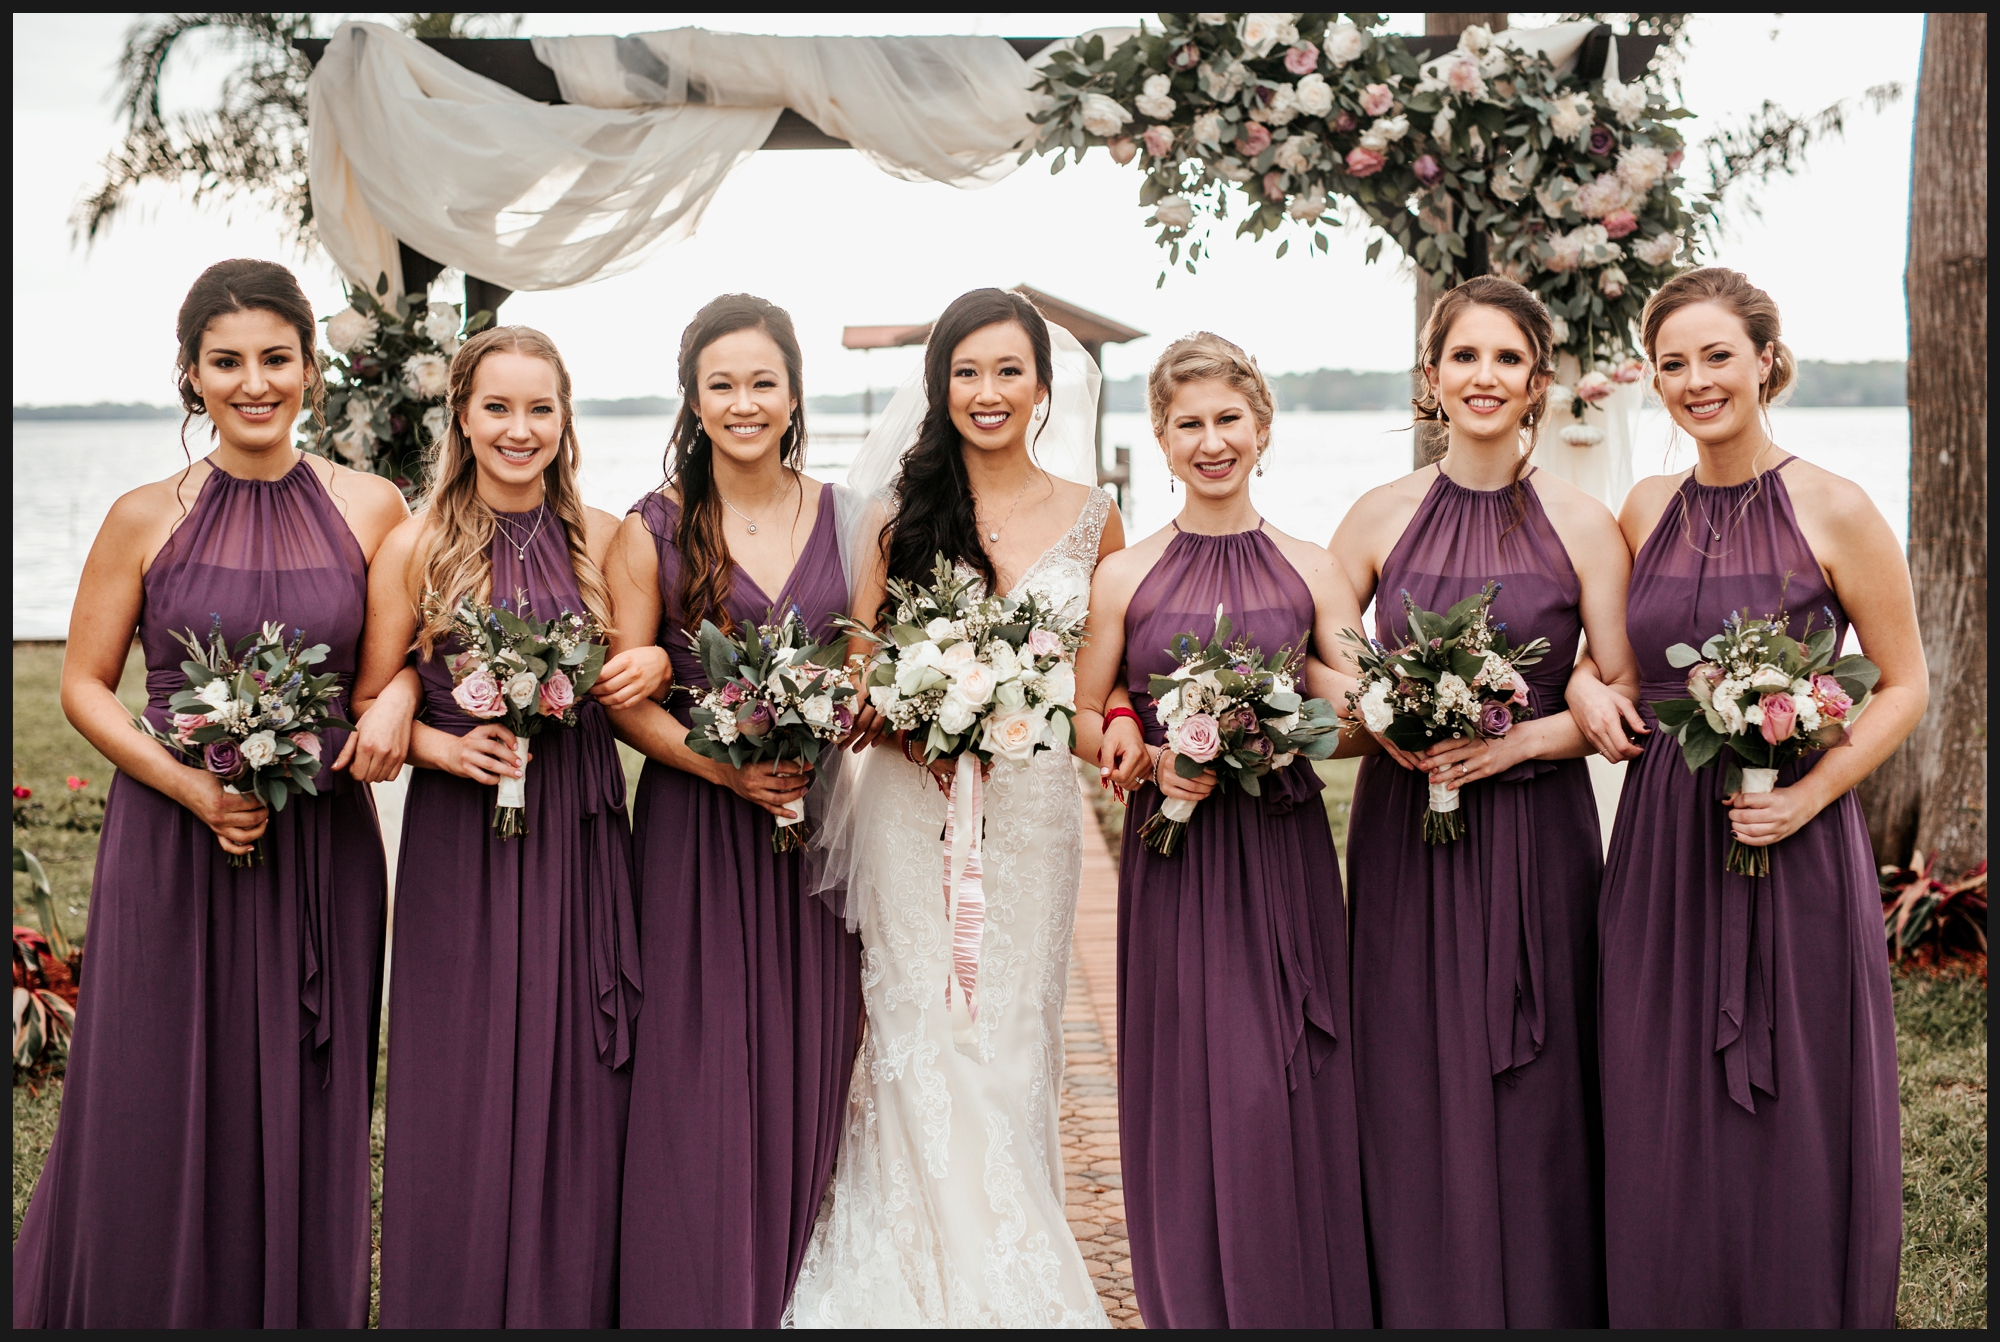 Orlando-Wedding-Photographer-destination-wedding-photographer-florida-wedding-photographer-bohemian-wedding-photographer_1435.jpg